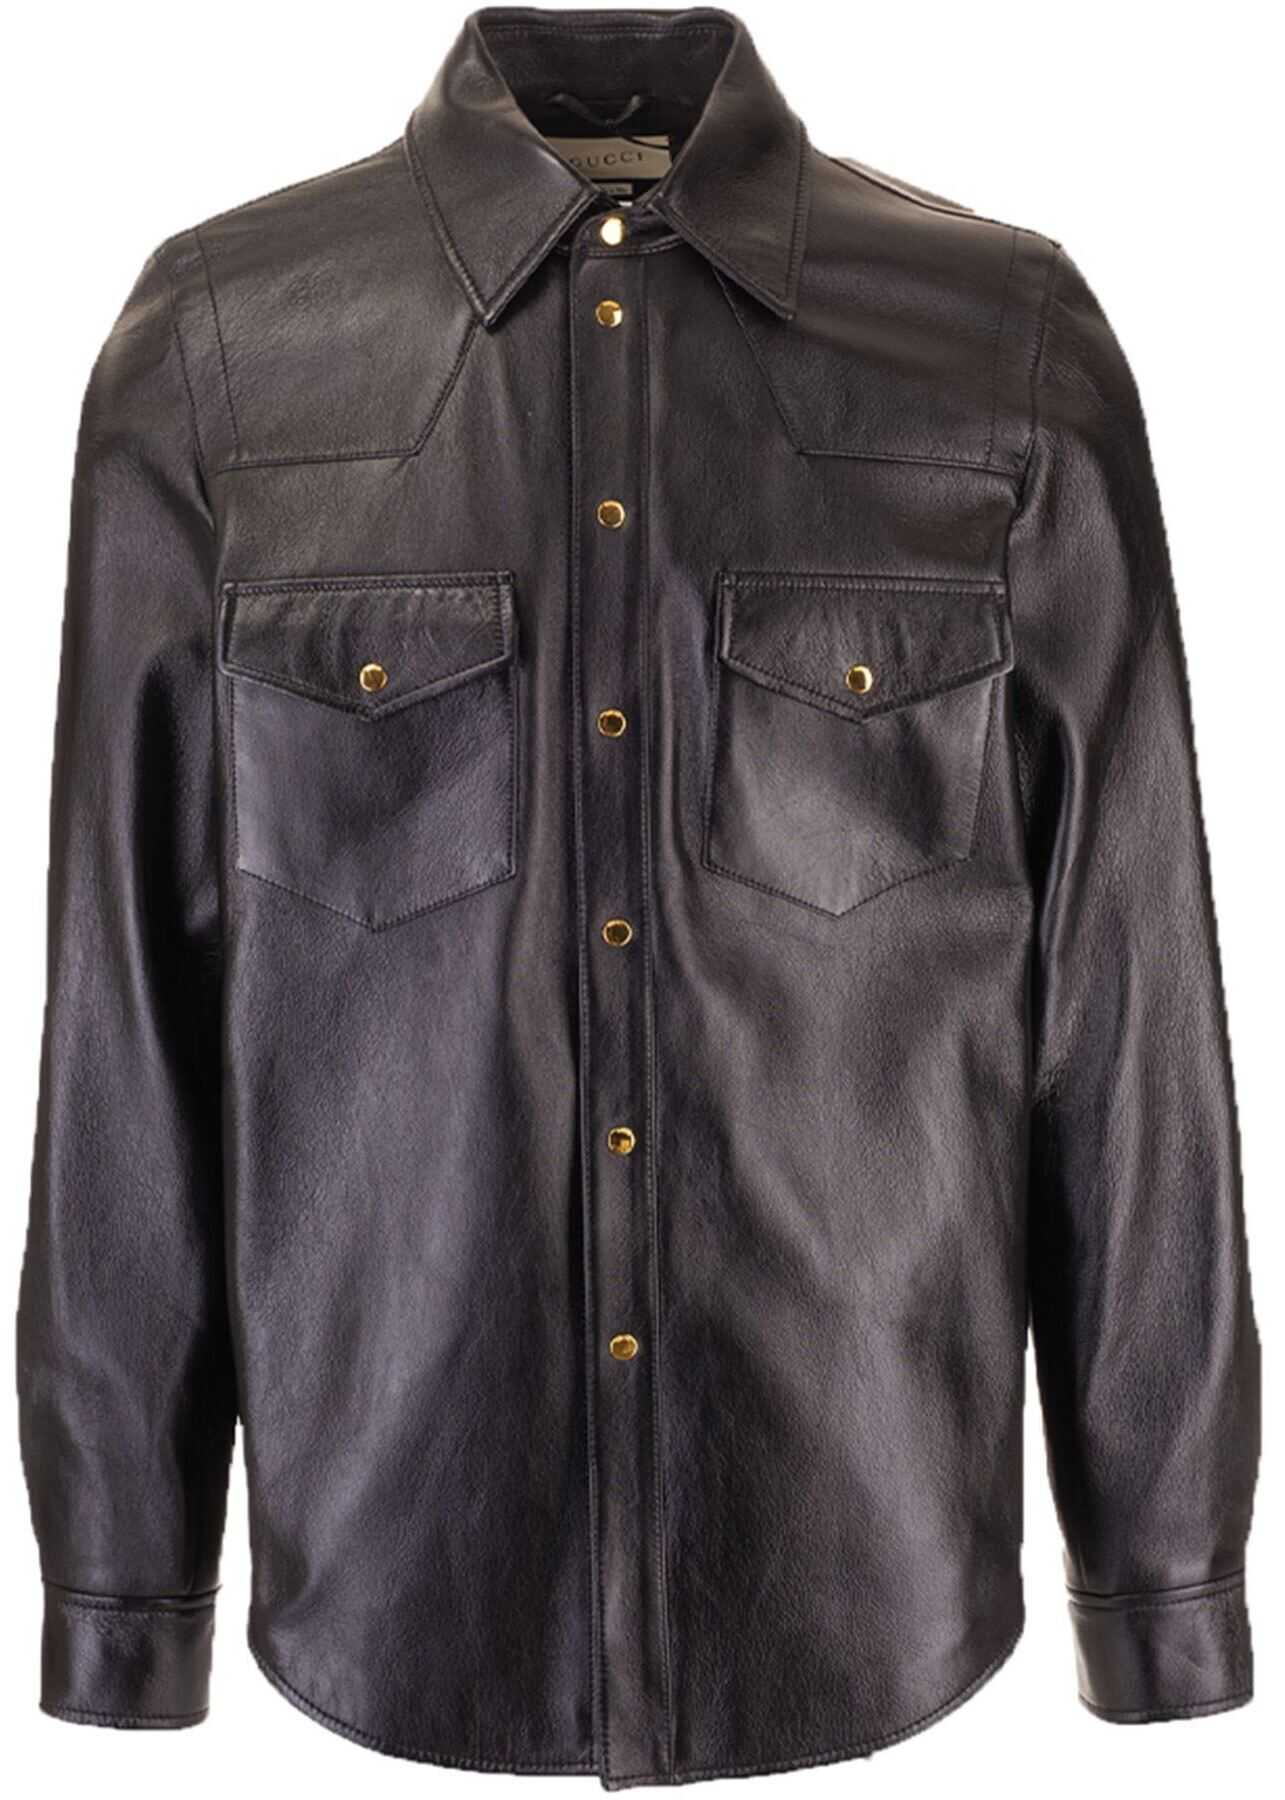 Gucci Gucci Leather Shirt In Black Black imagine